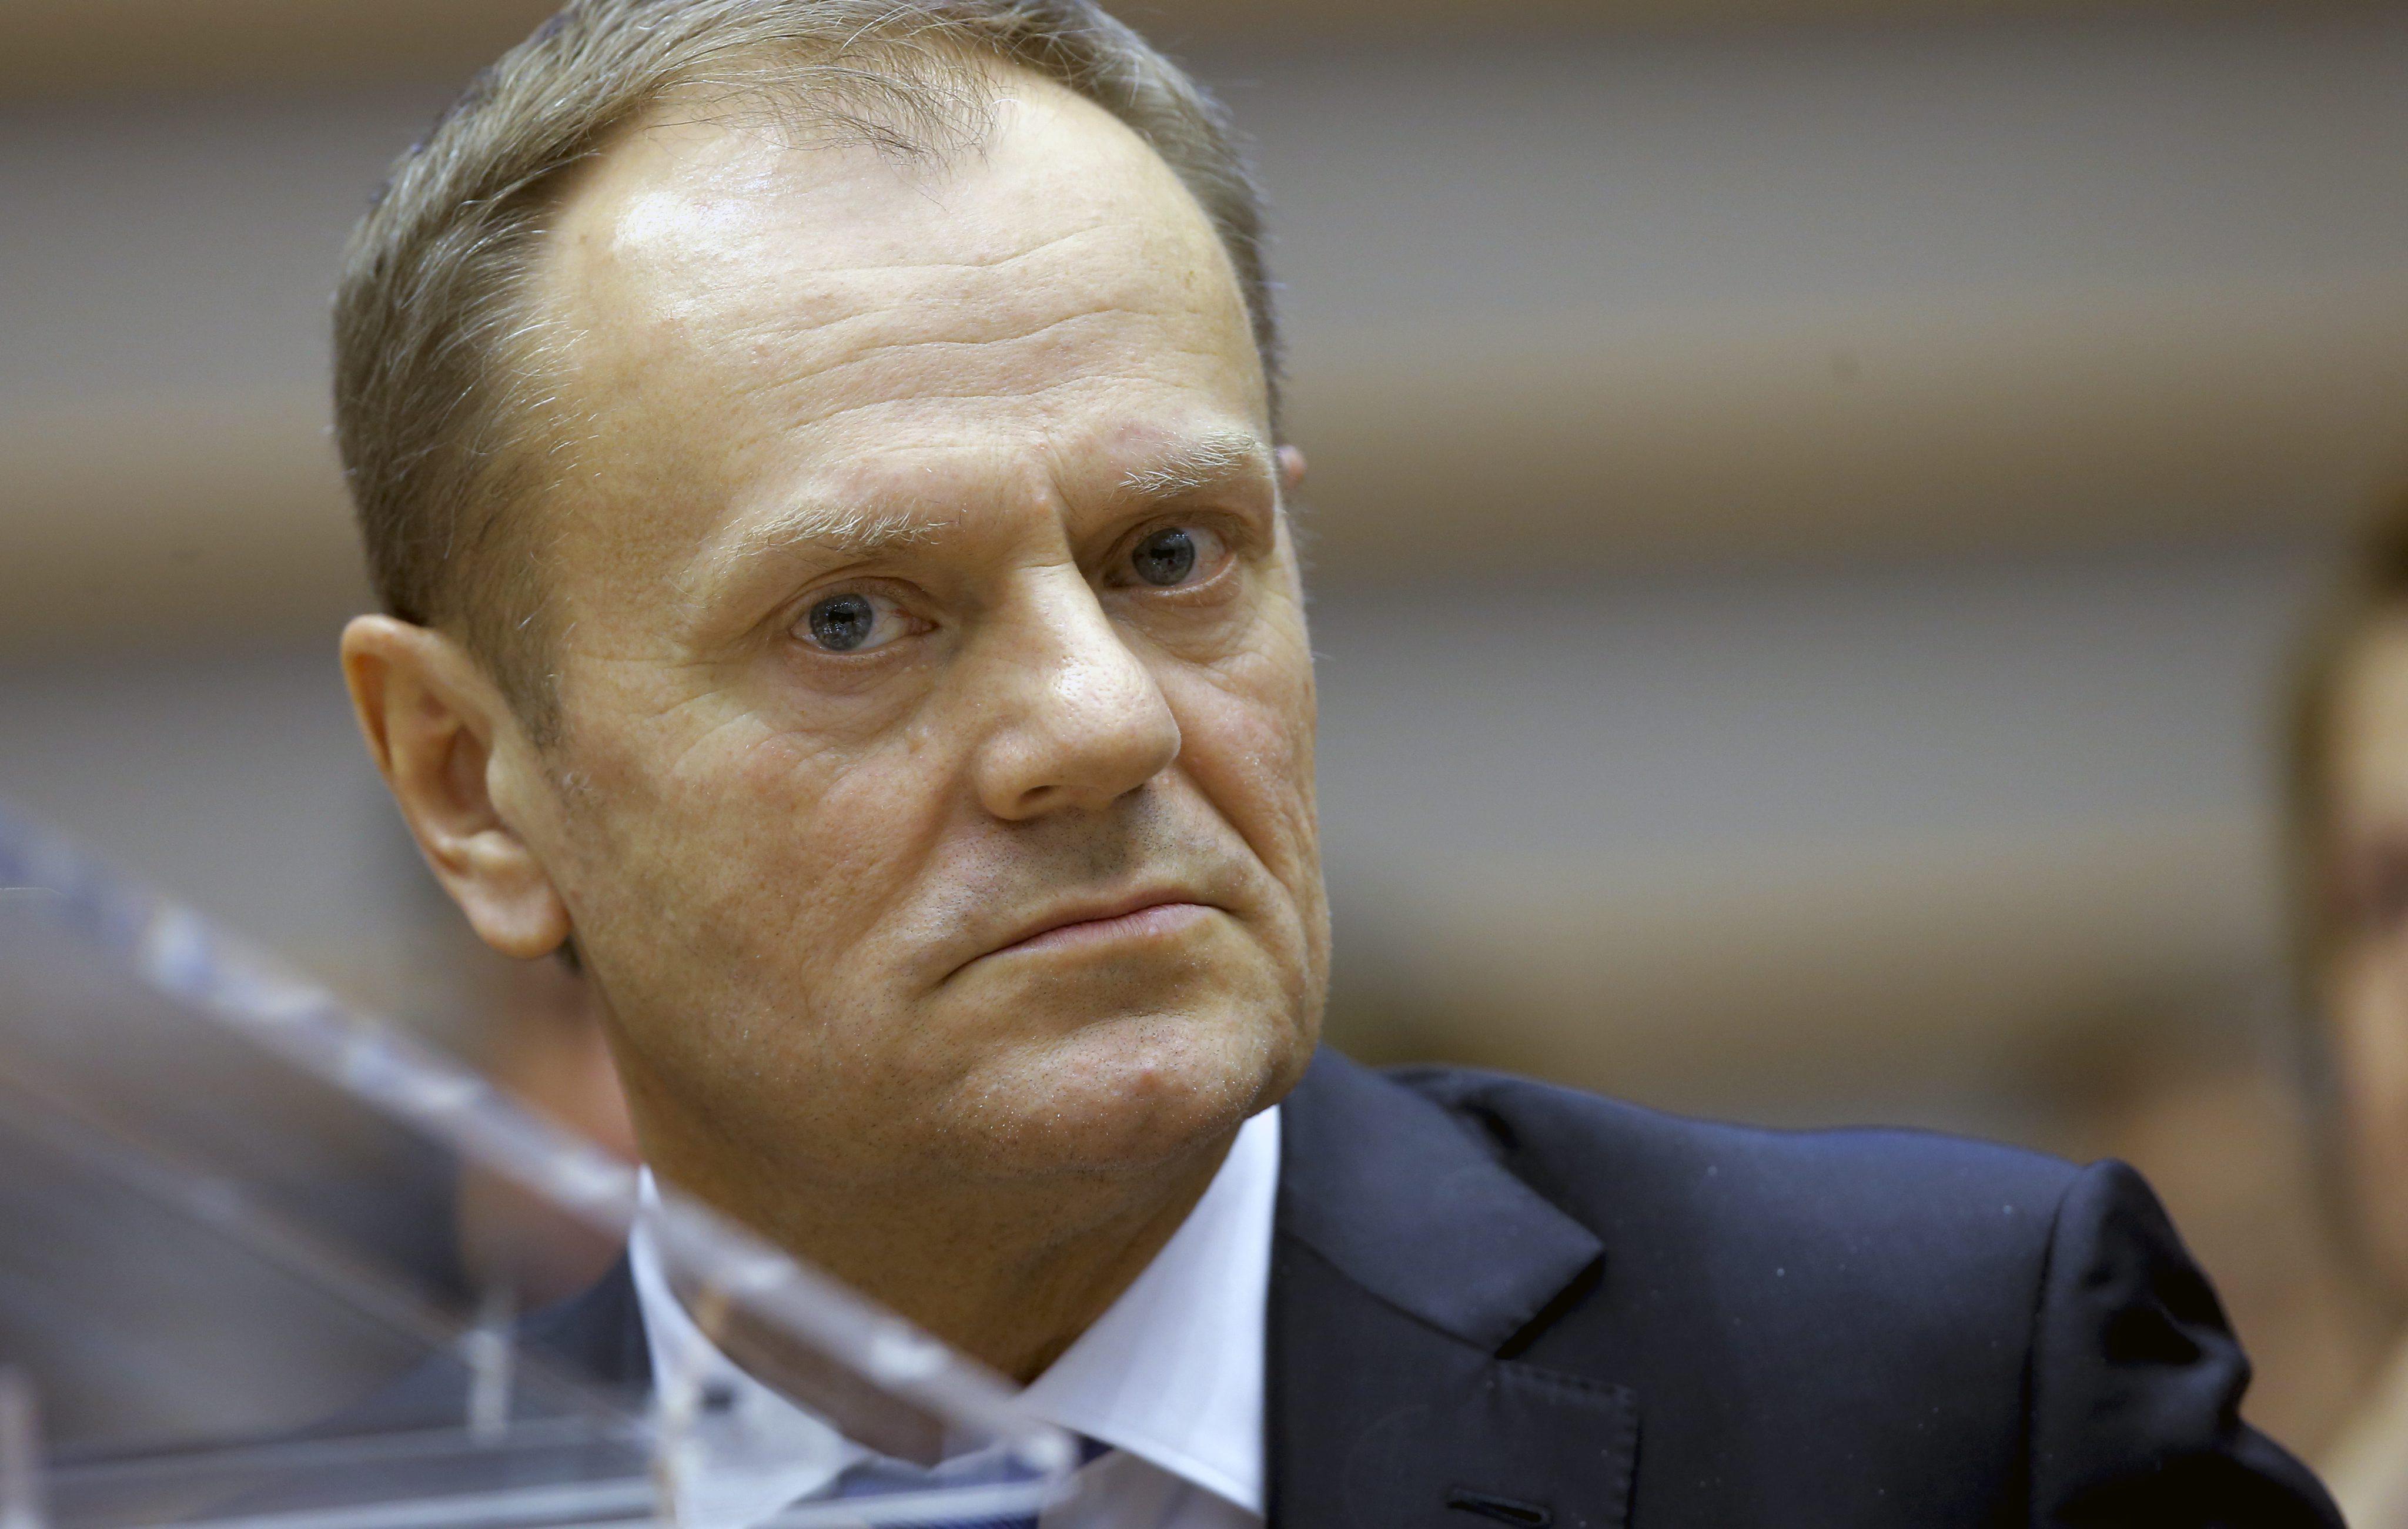 Tusk reelegido presidente del consejo europeo for Presidente del consejo europeo